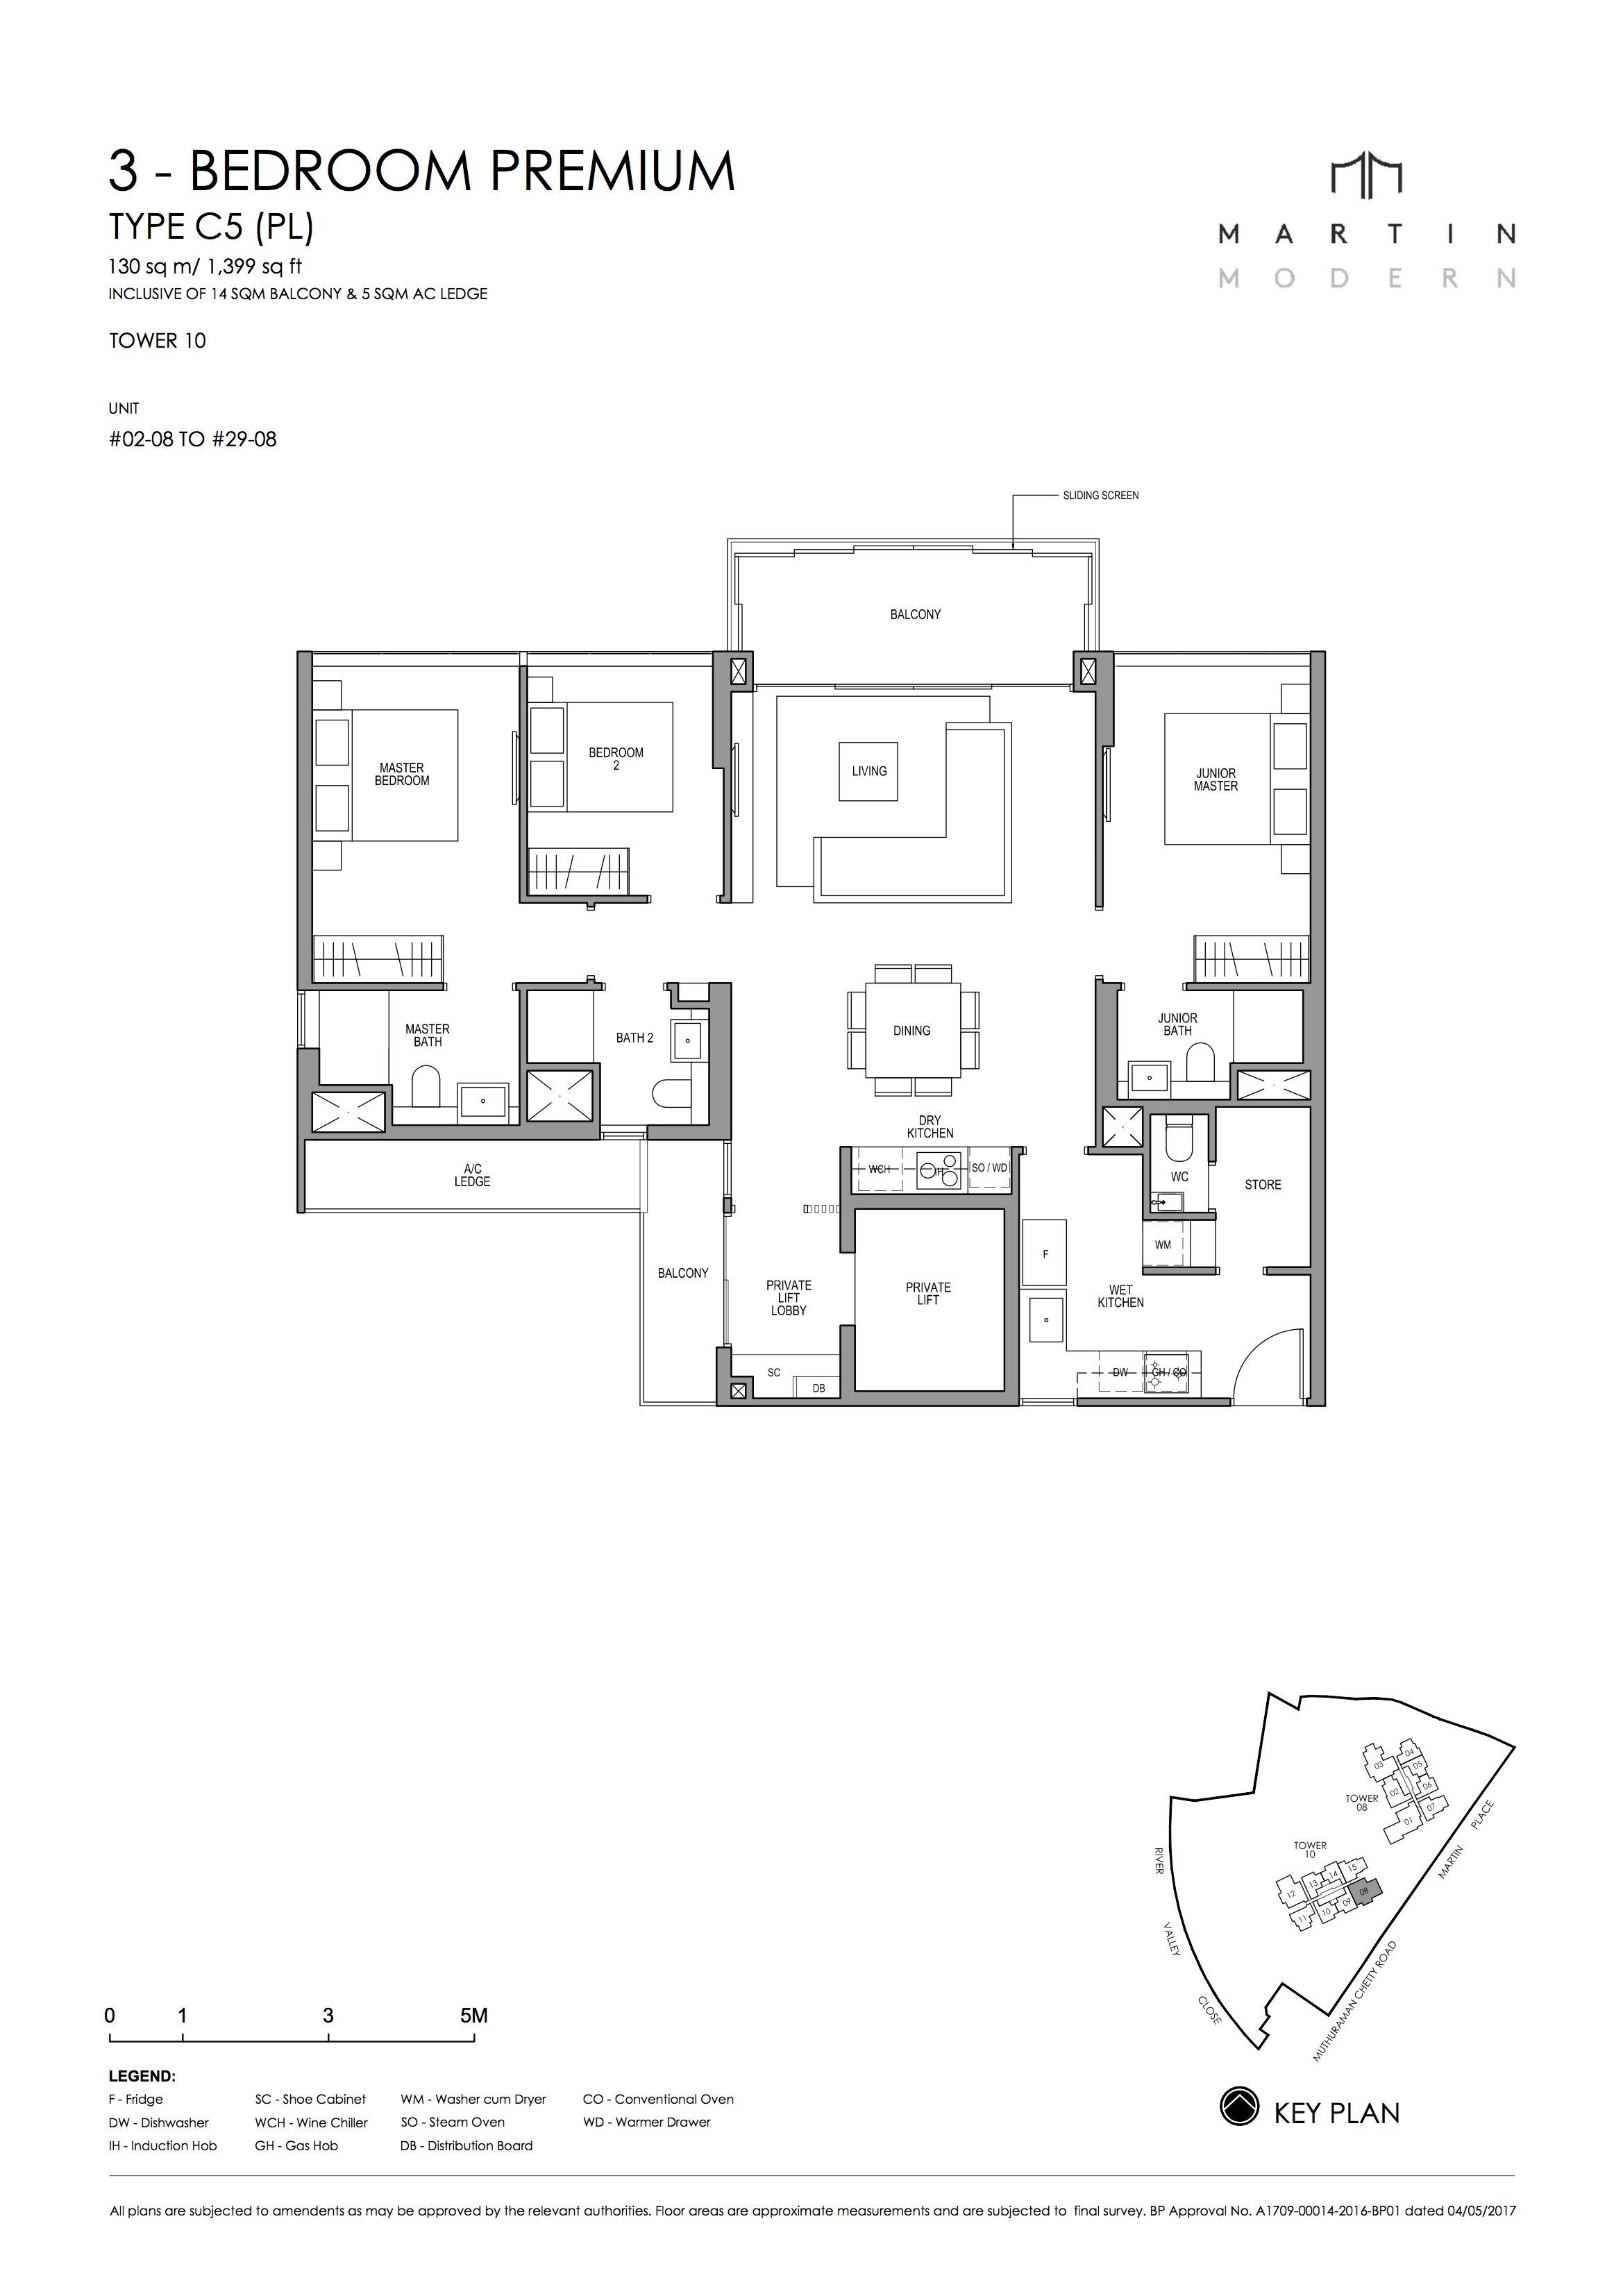 MARTIN MODERN 3-Bedroom TYPE C5PL